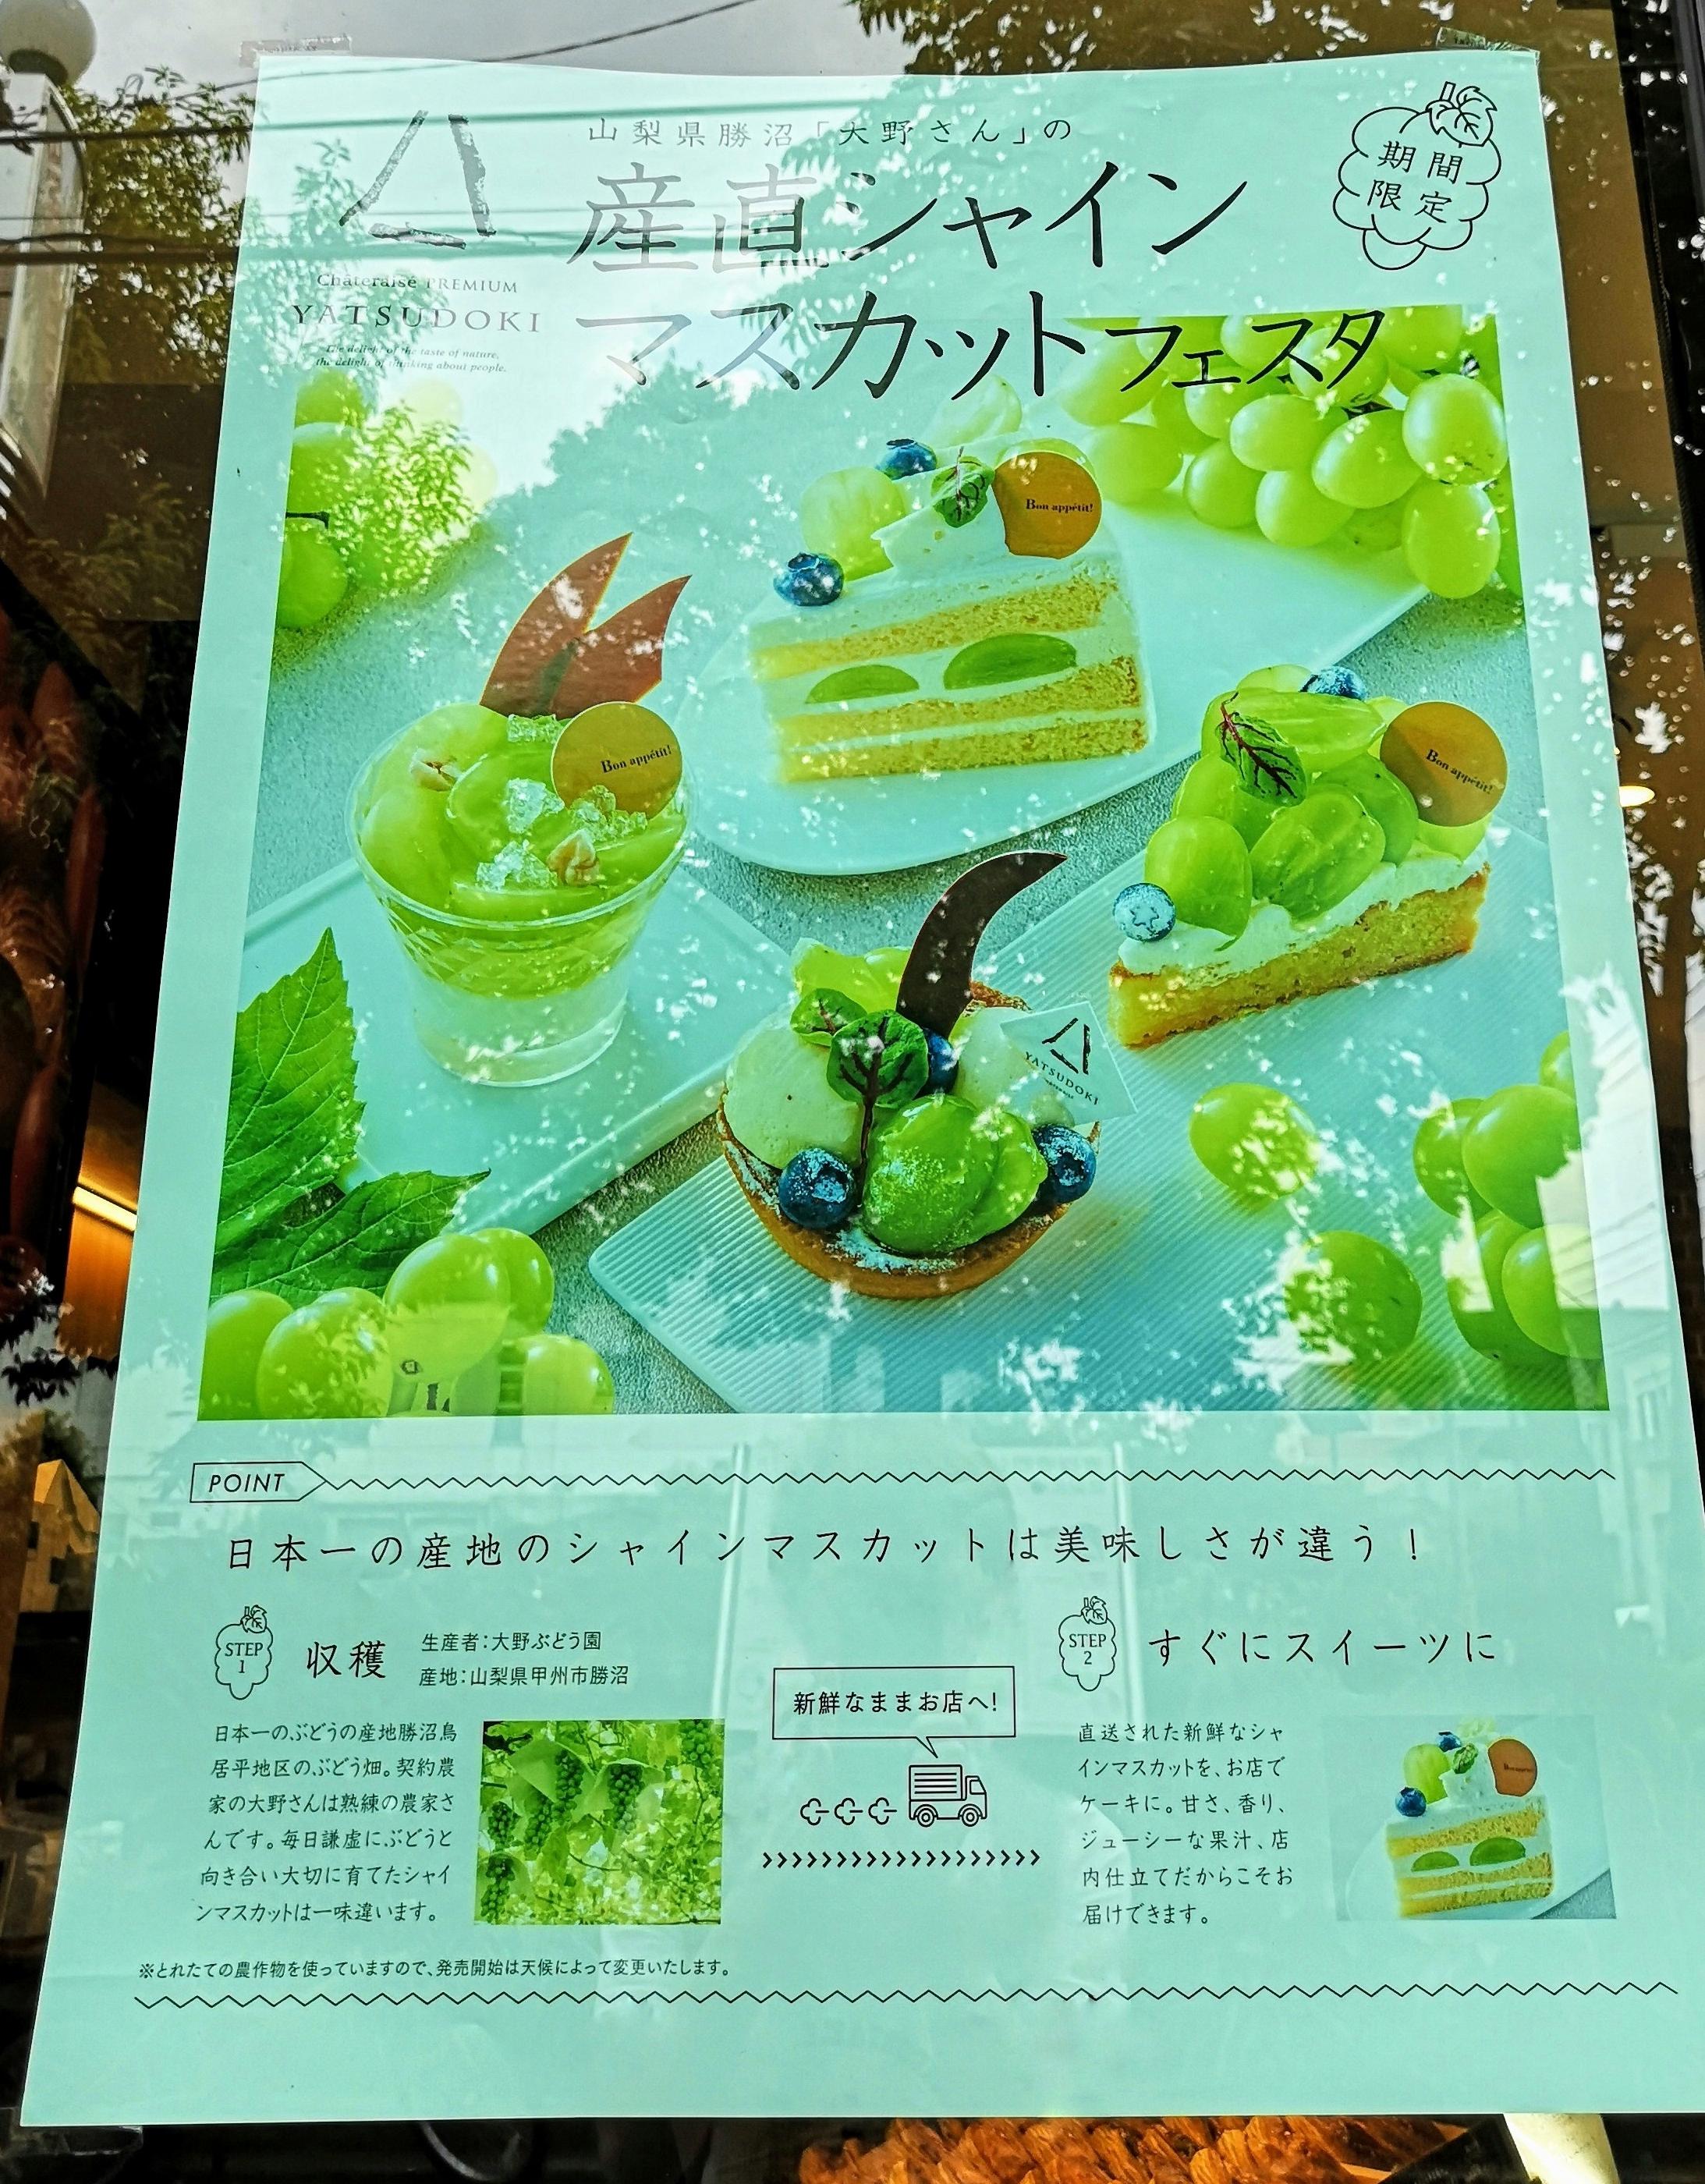 "【YATSUDOKI】""シャインマスカットフェスタ""開催中!素材の良さが光るショートケーキを実食ルポ 画像2"